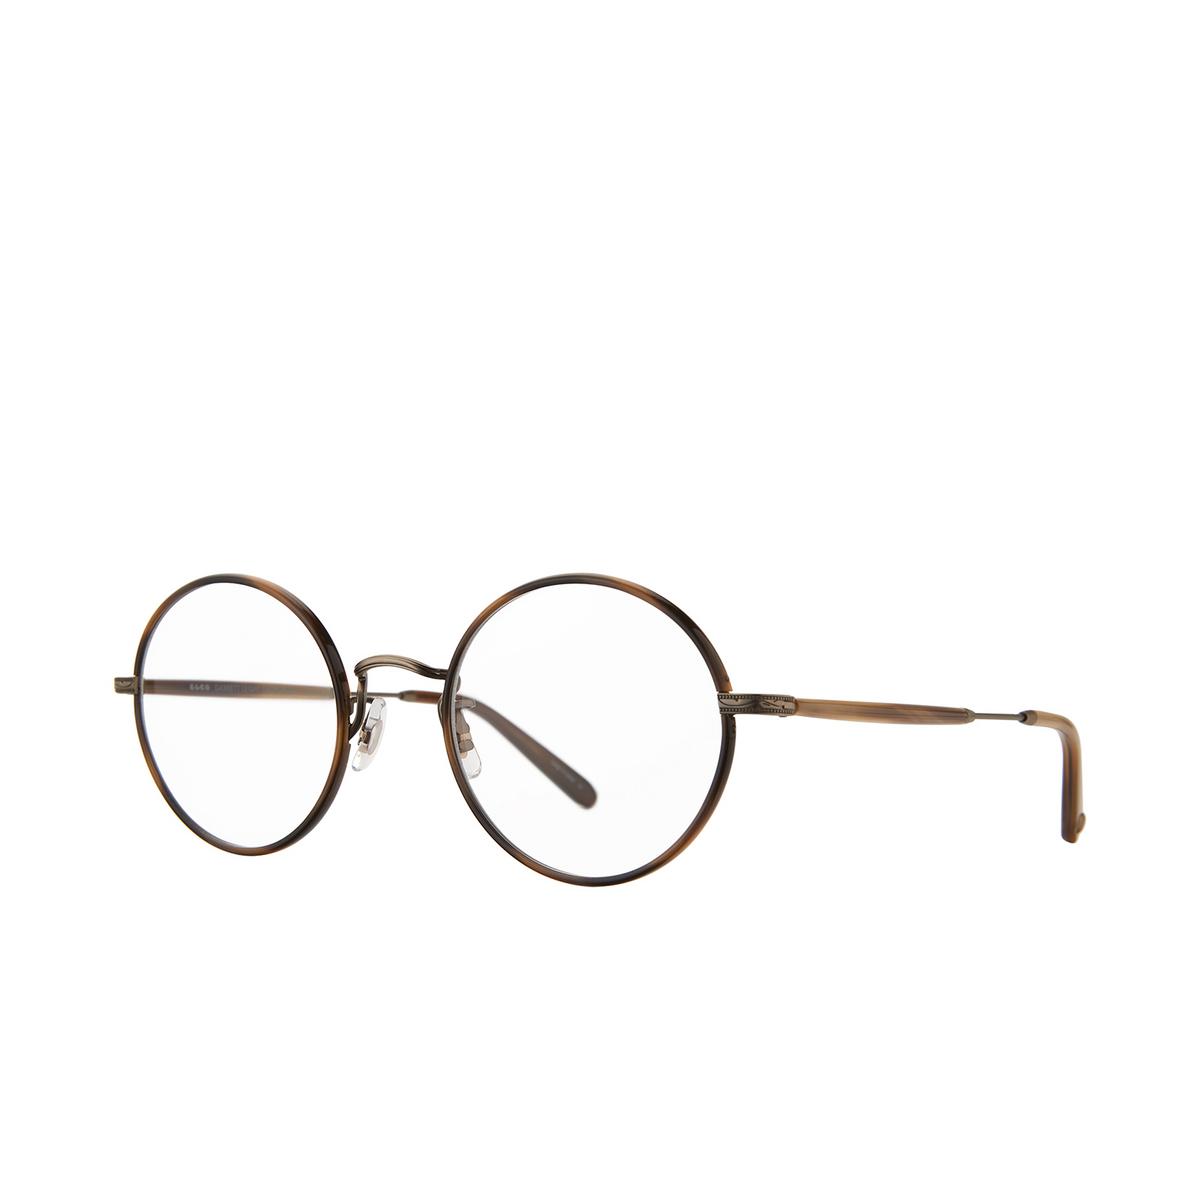 Garrett Leight® Round Eyeglasses: Fonda color Demi Blonde - Antique Gold Db-atg-td.